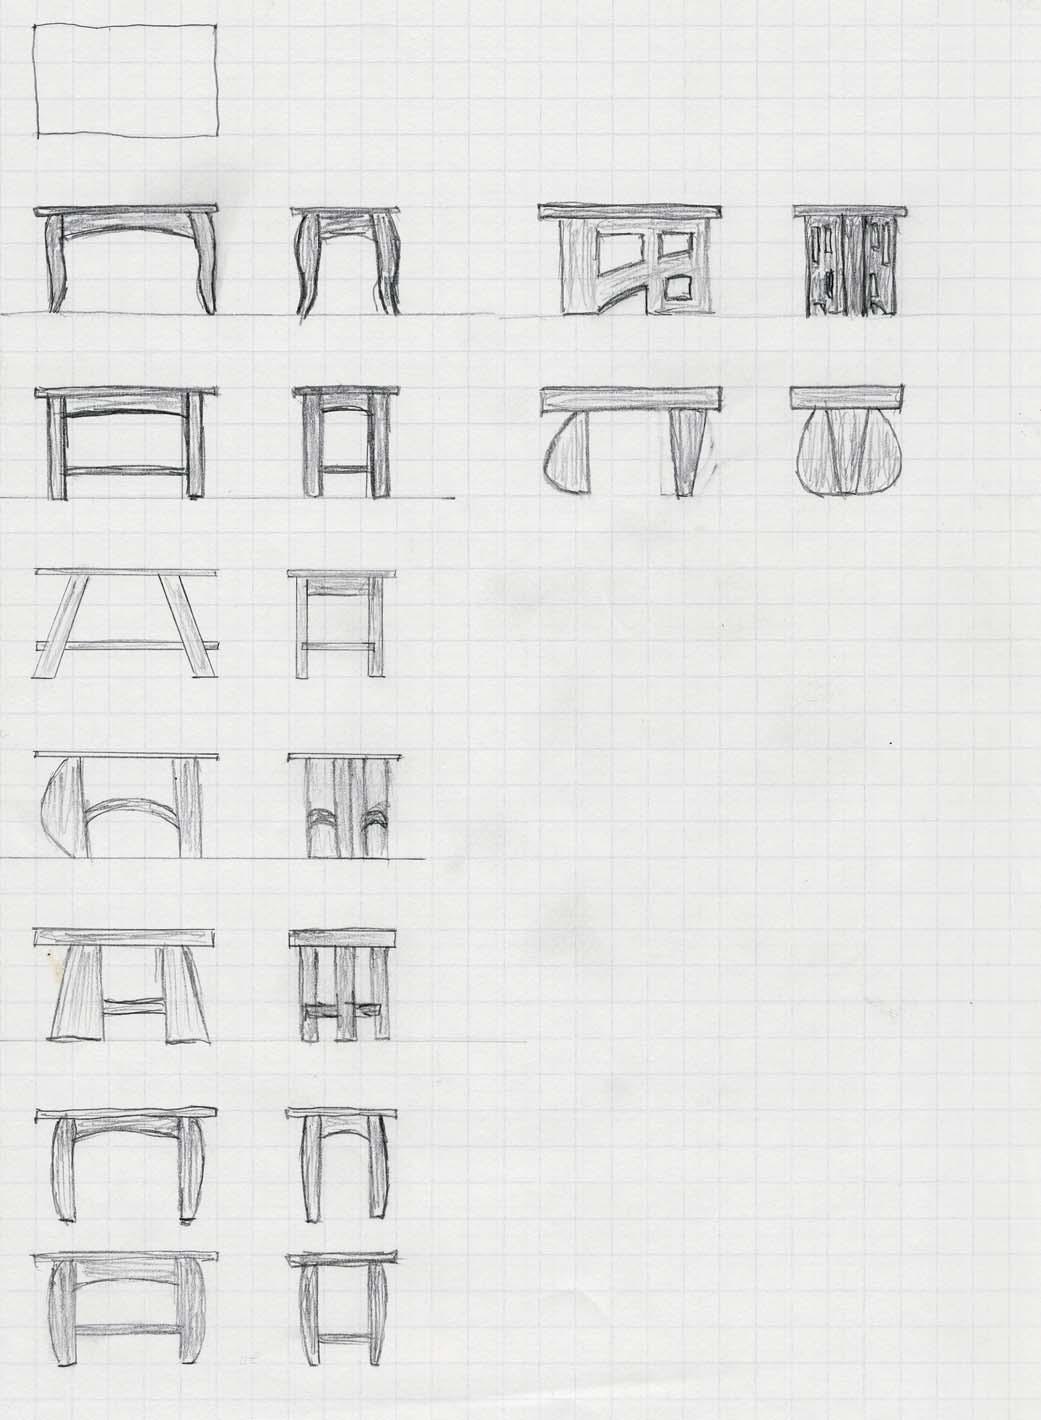 Sketching And Design Development Popular Woodworking Magazine